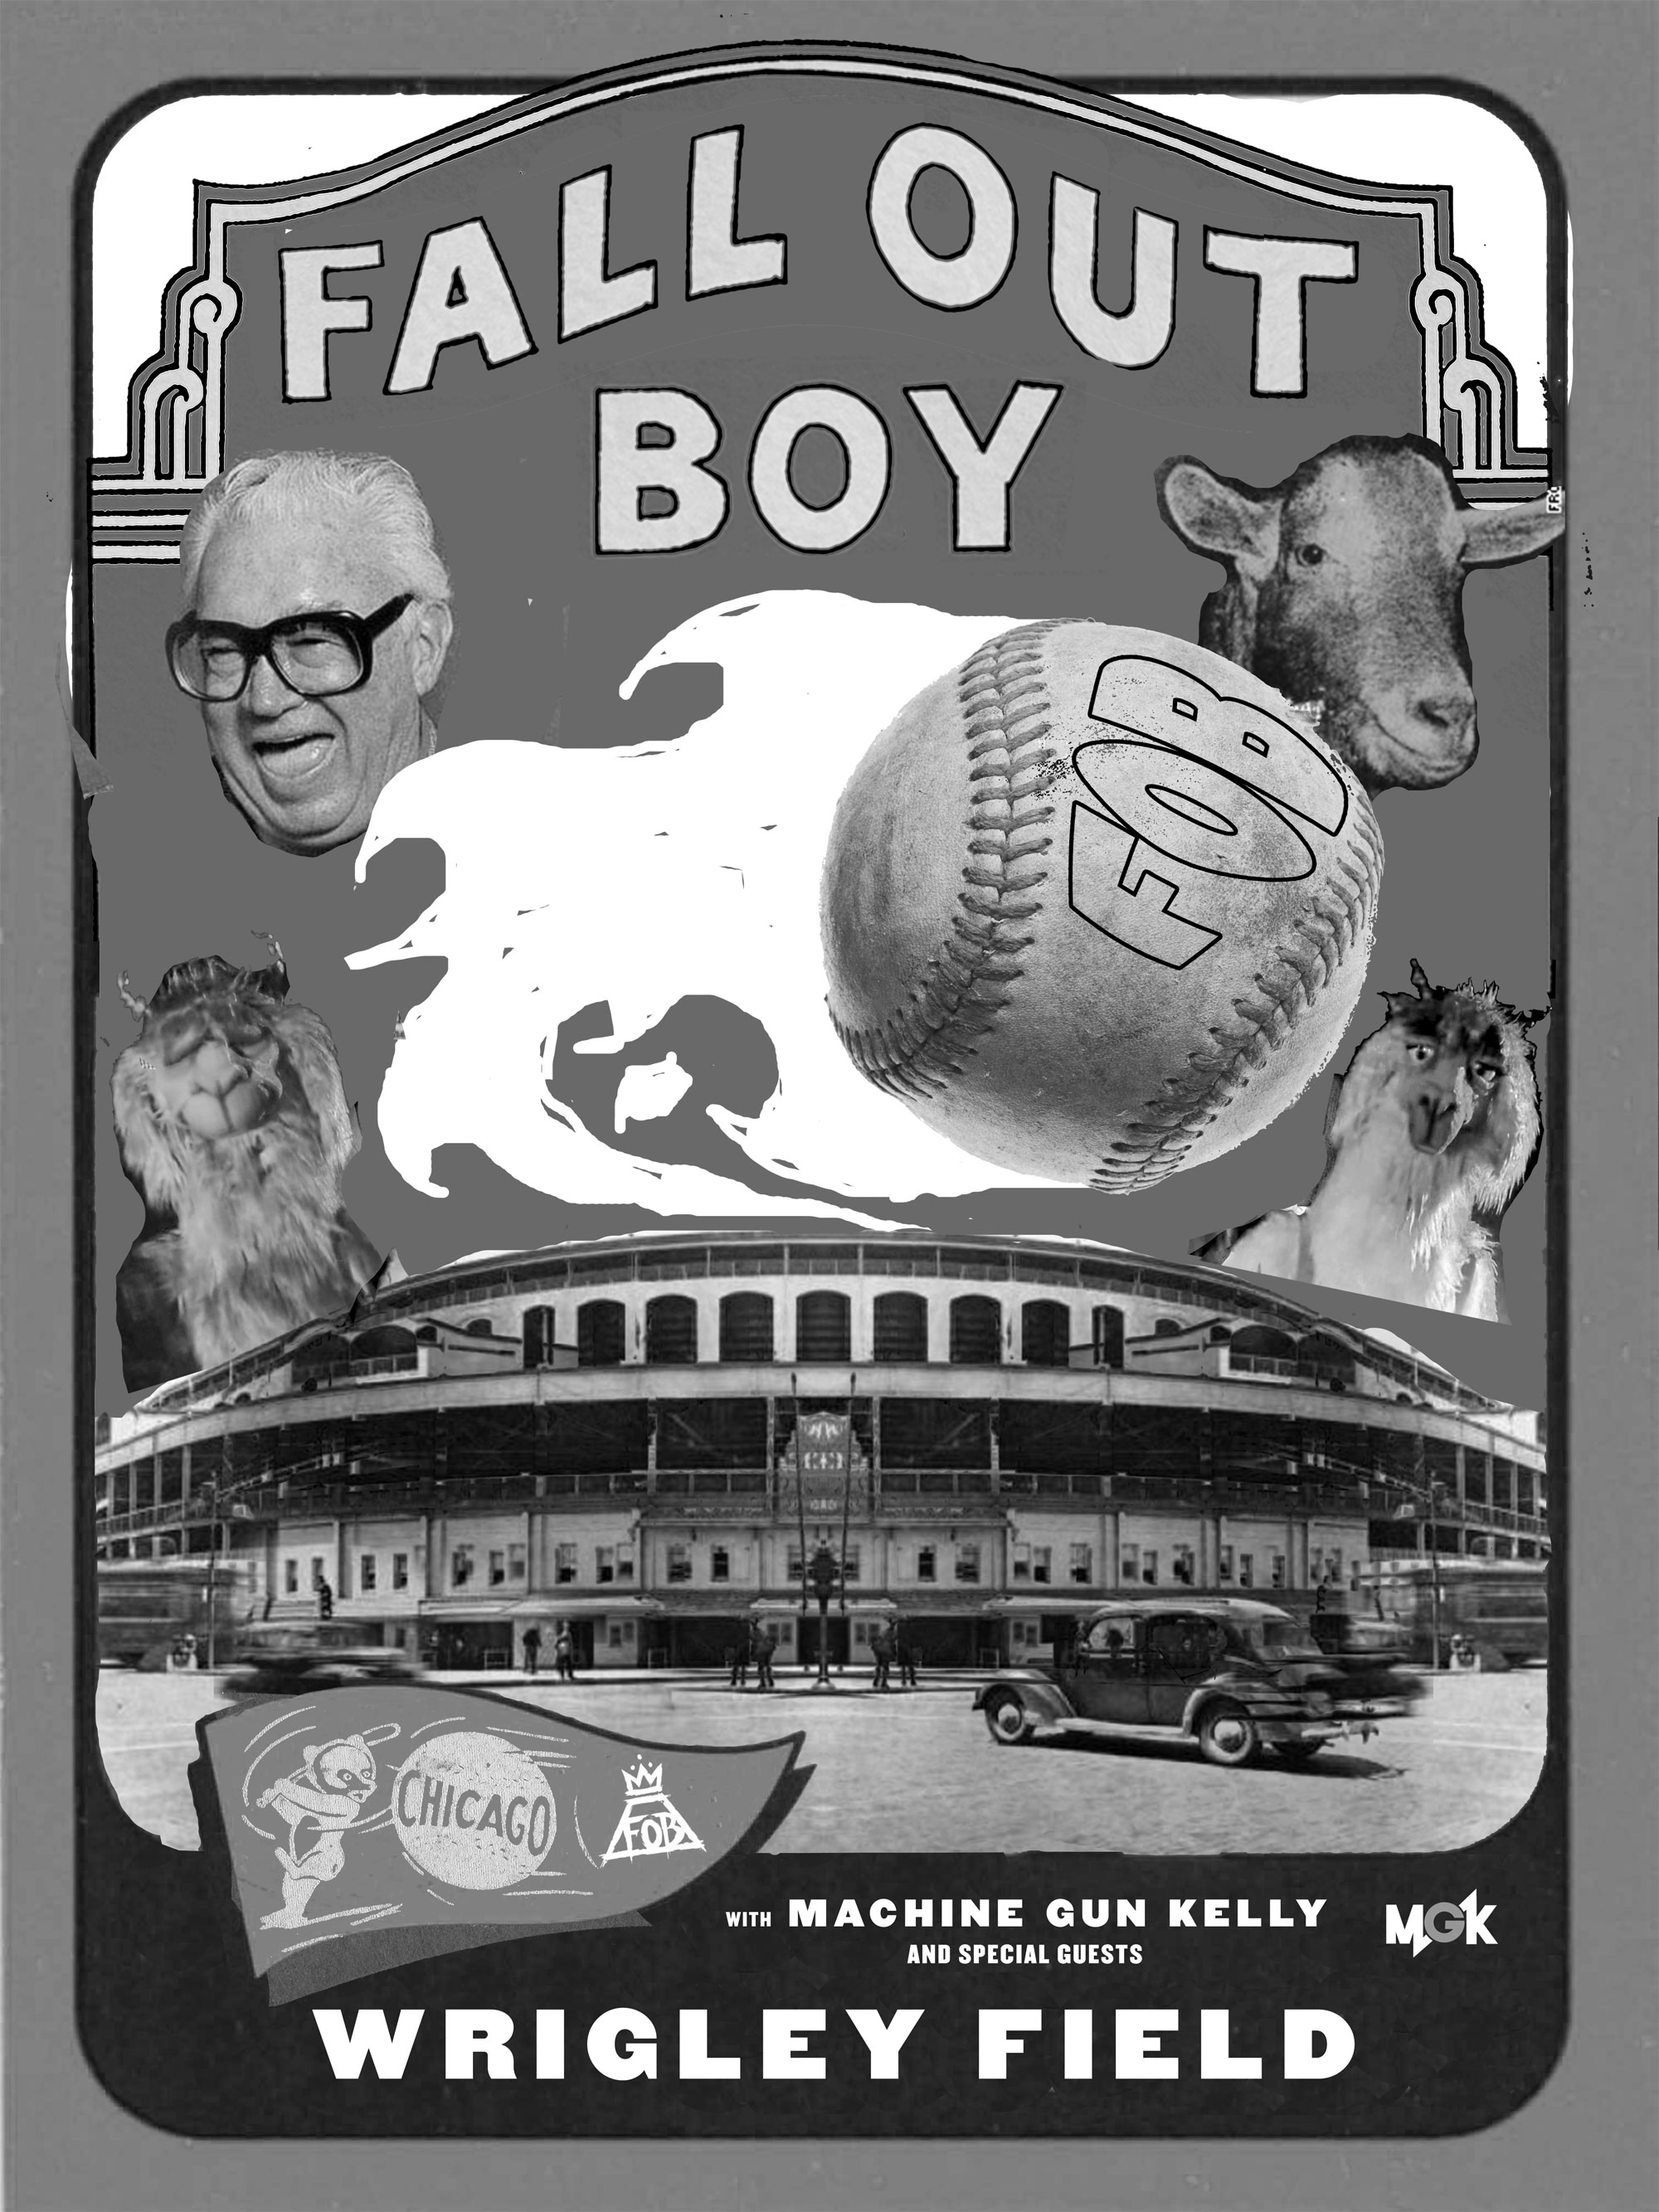 FOB-Wrigley-Field-Poster-Template.jpg